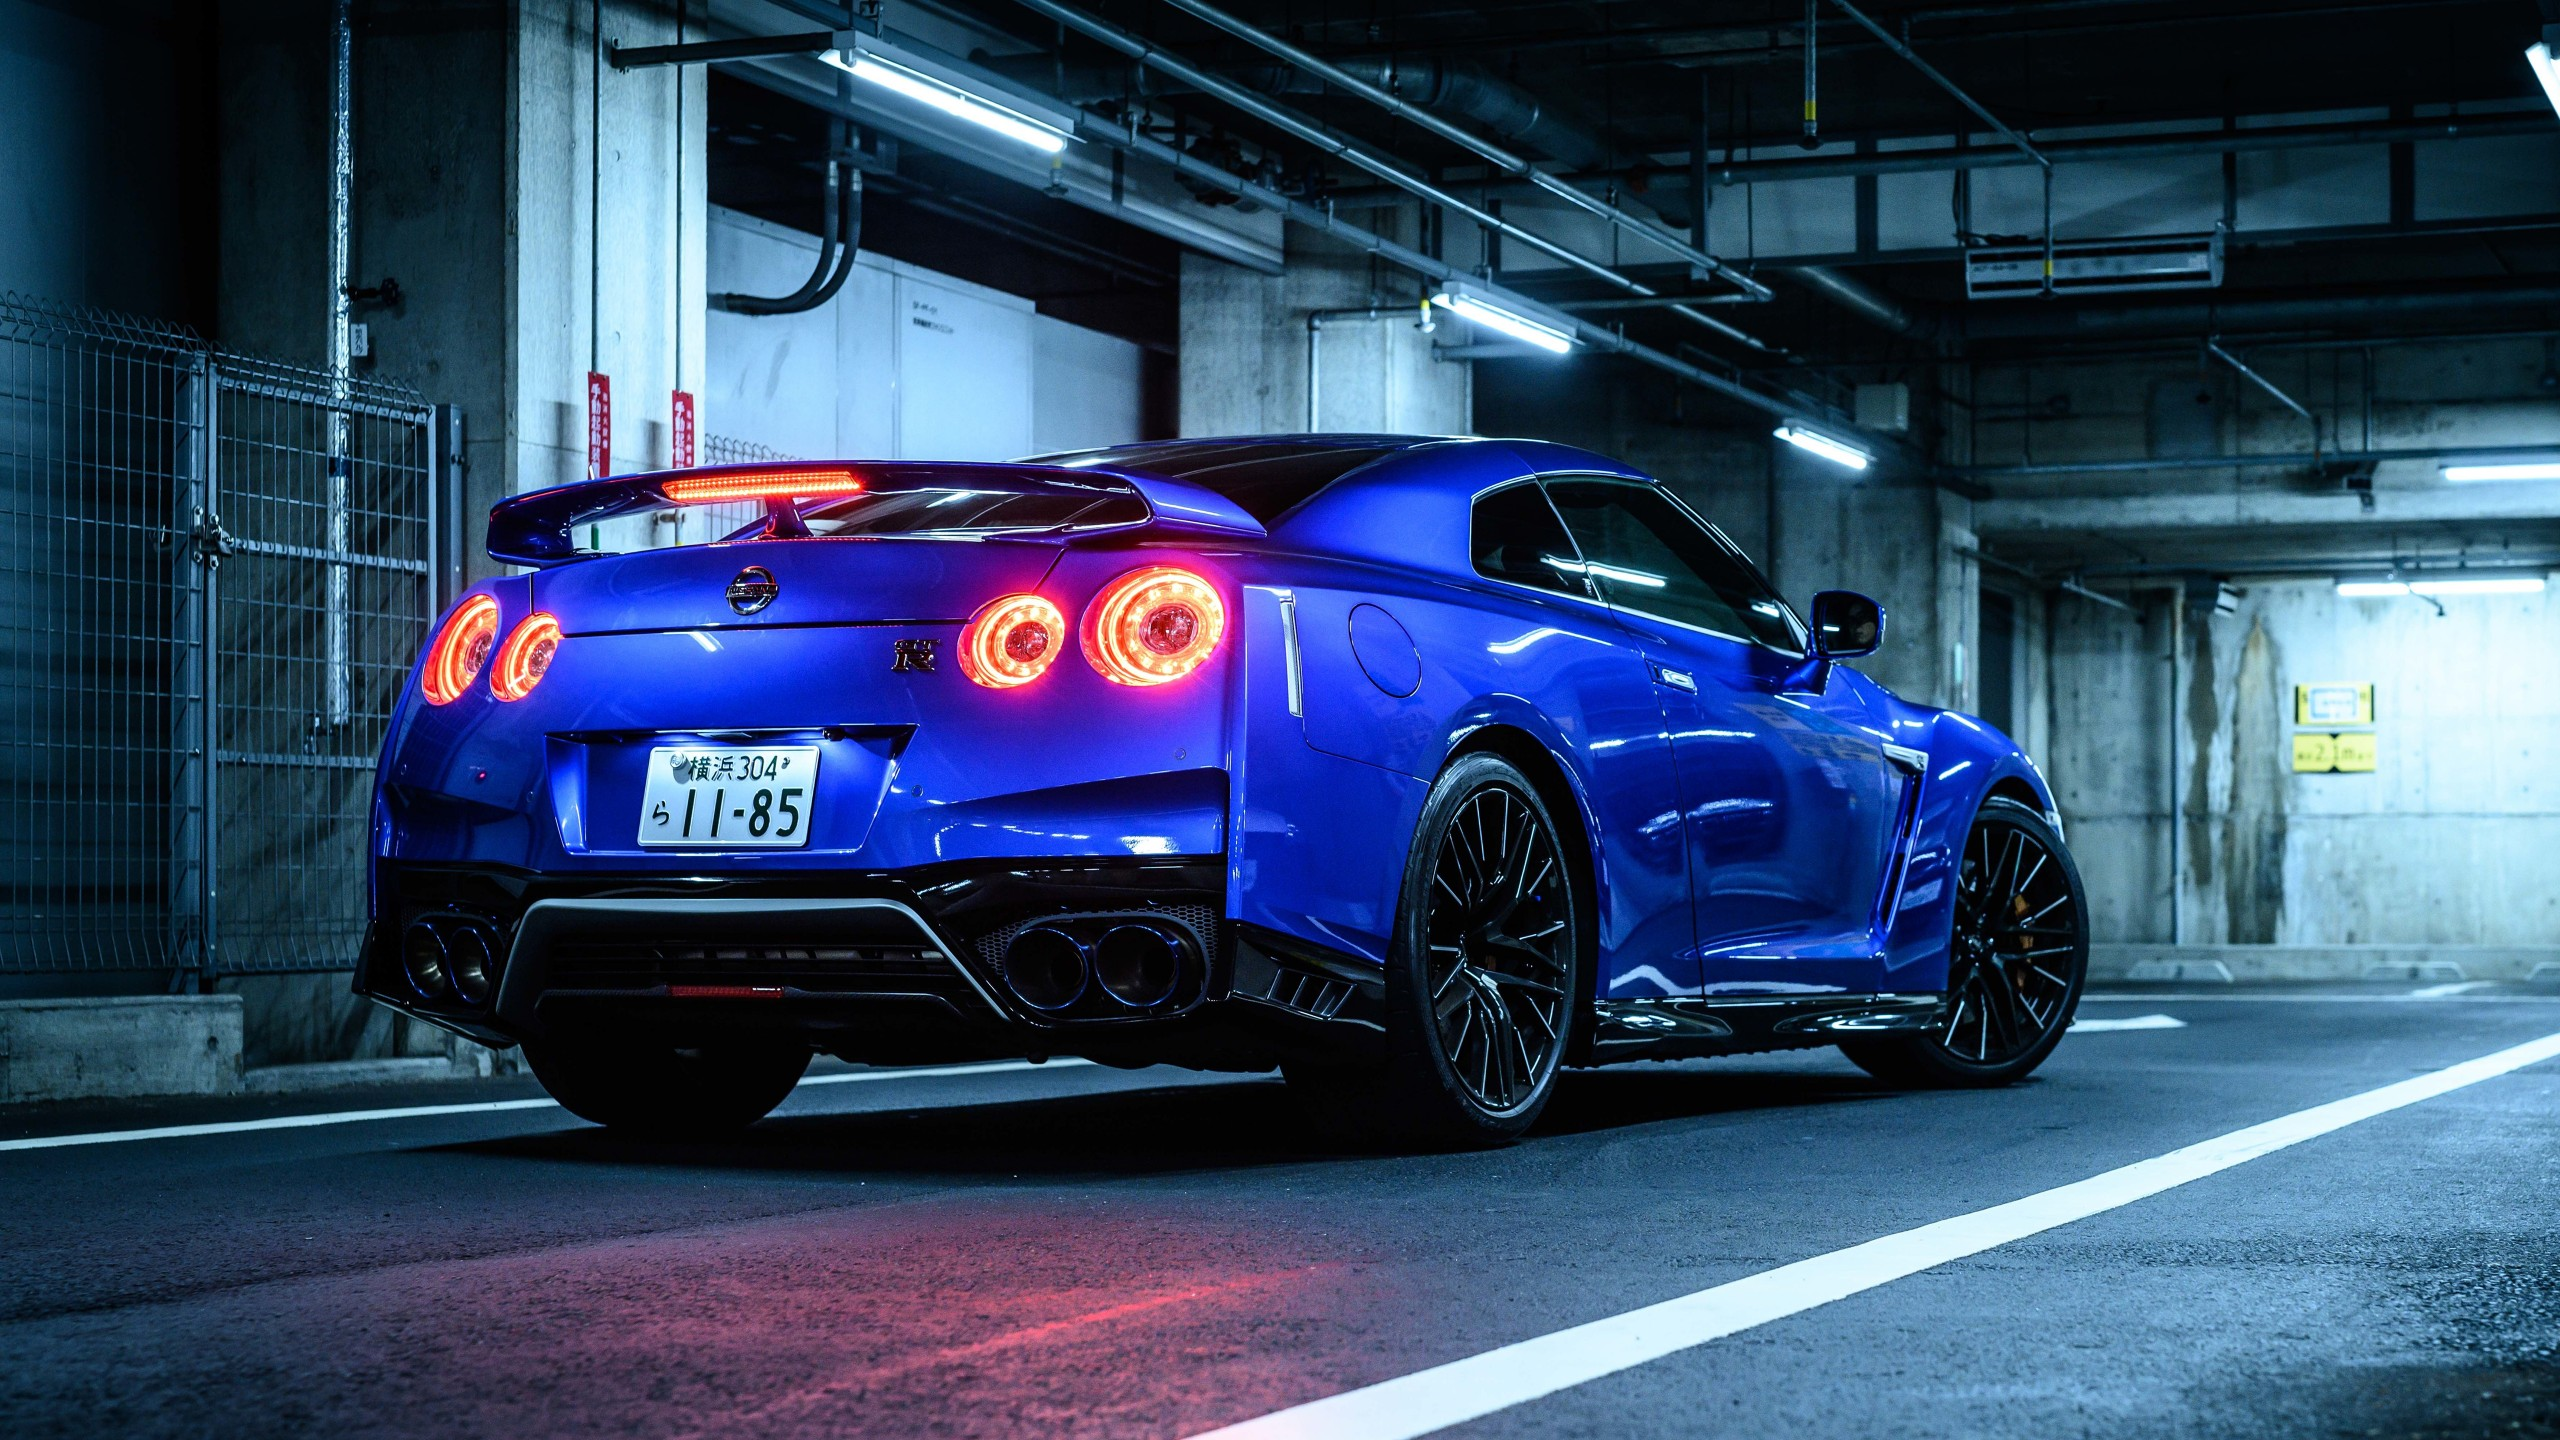 Nissan GT-R 50th Anniversary 2019 4K 2 Wallpaper | HD Car ...